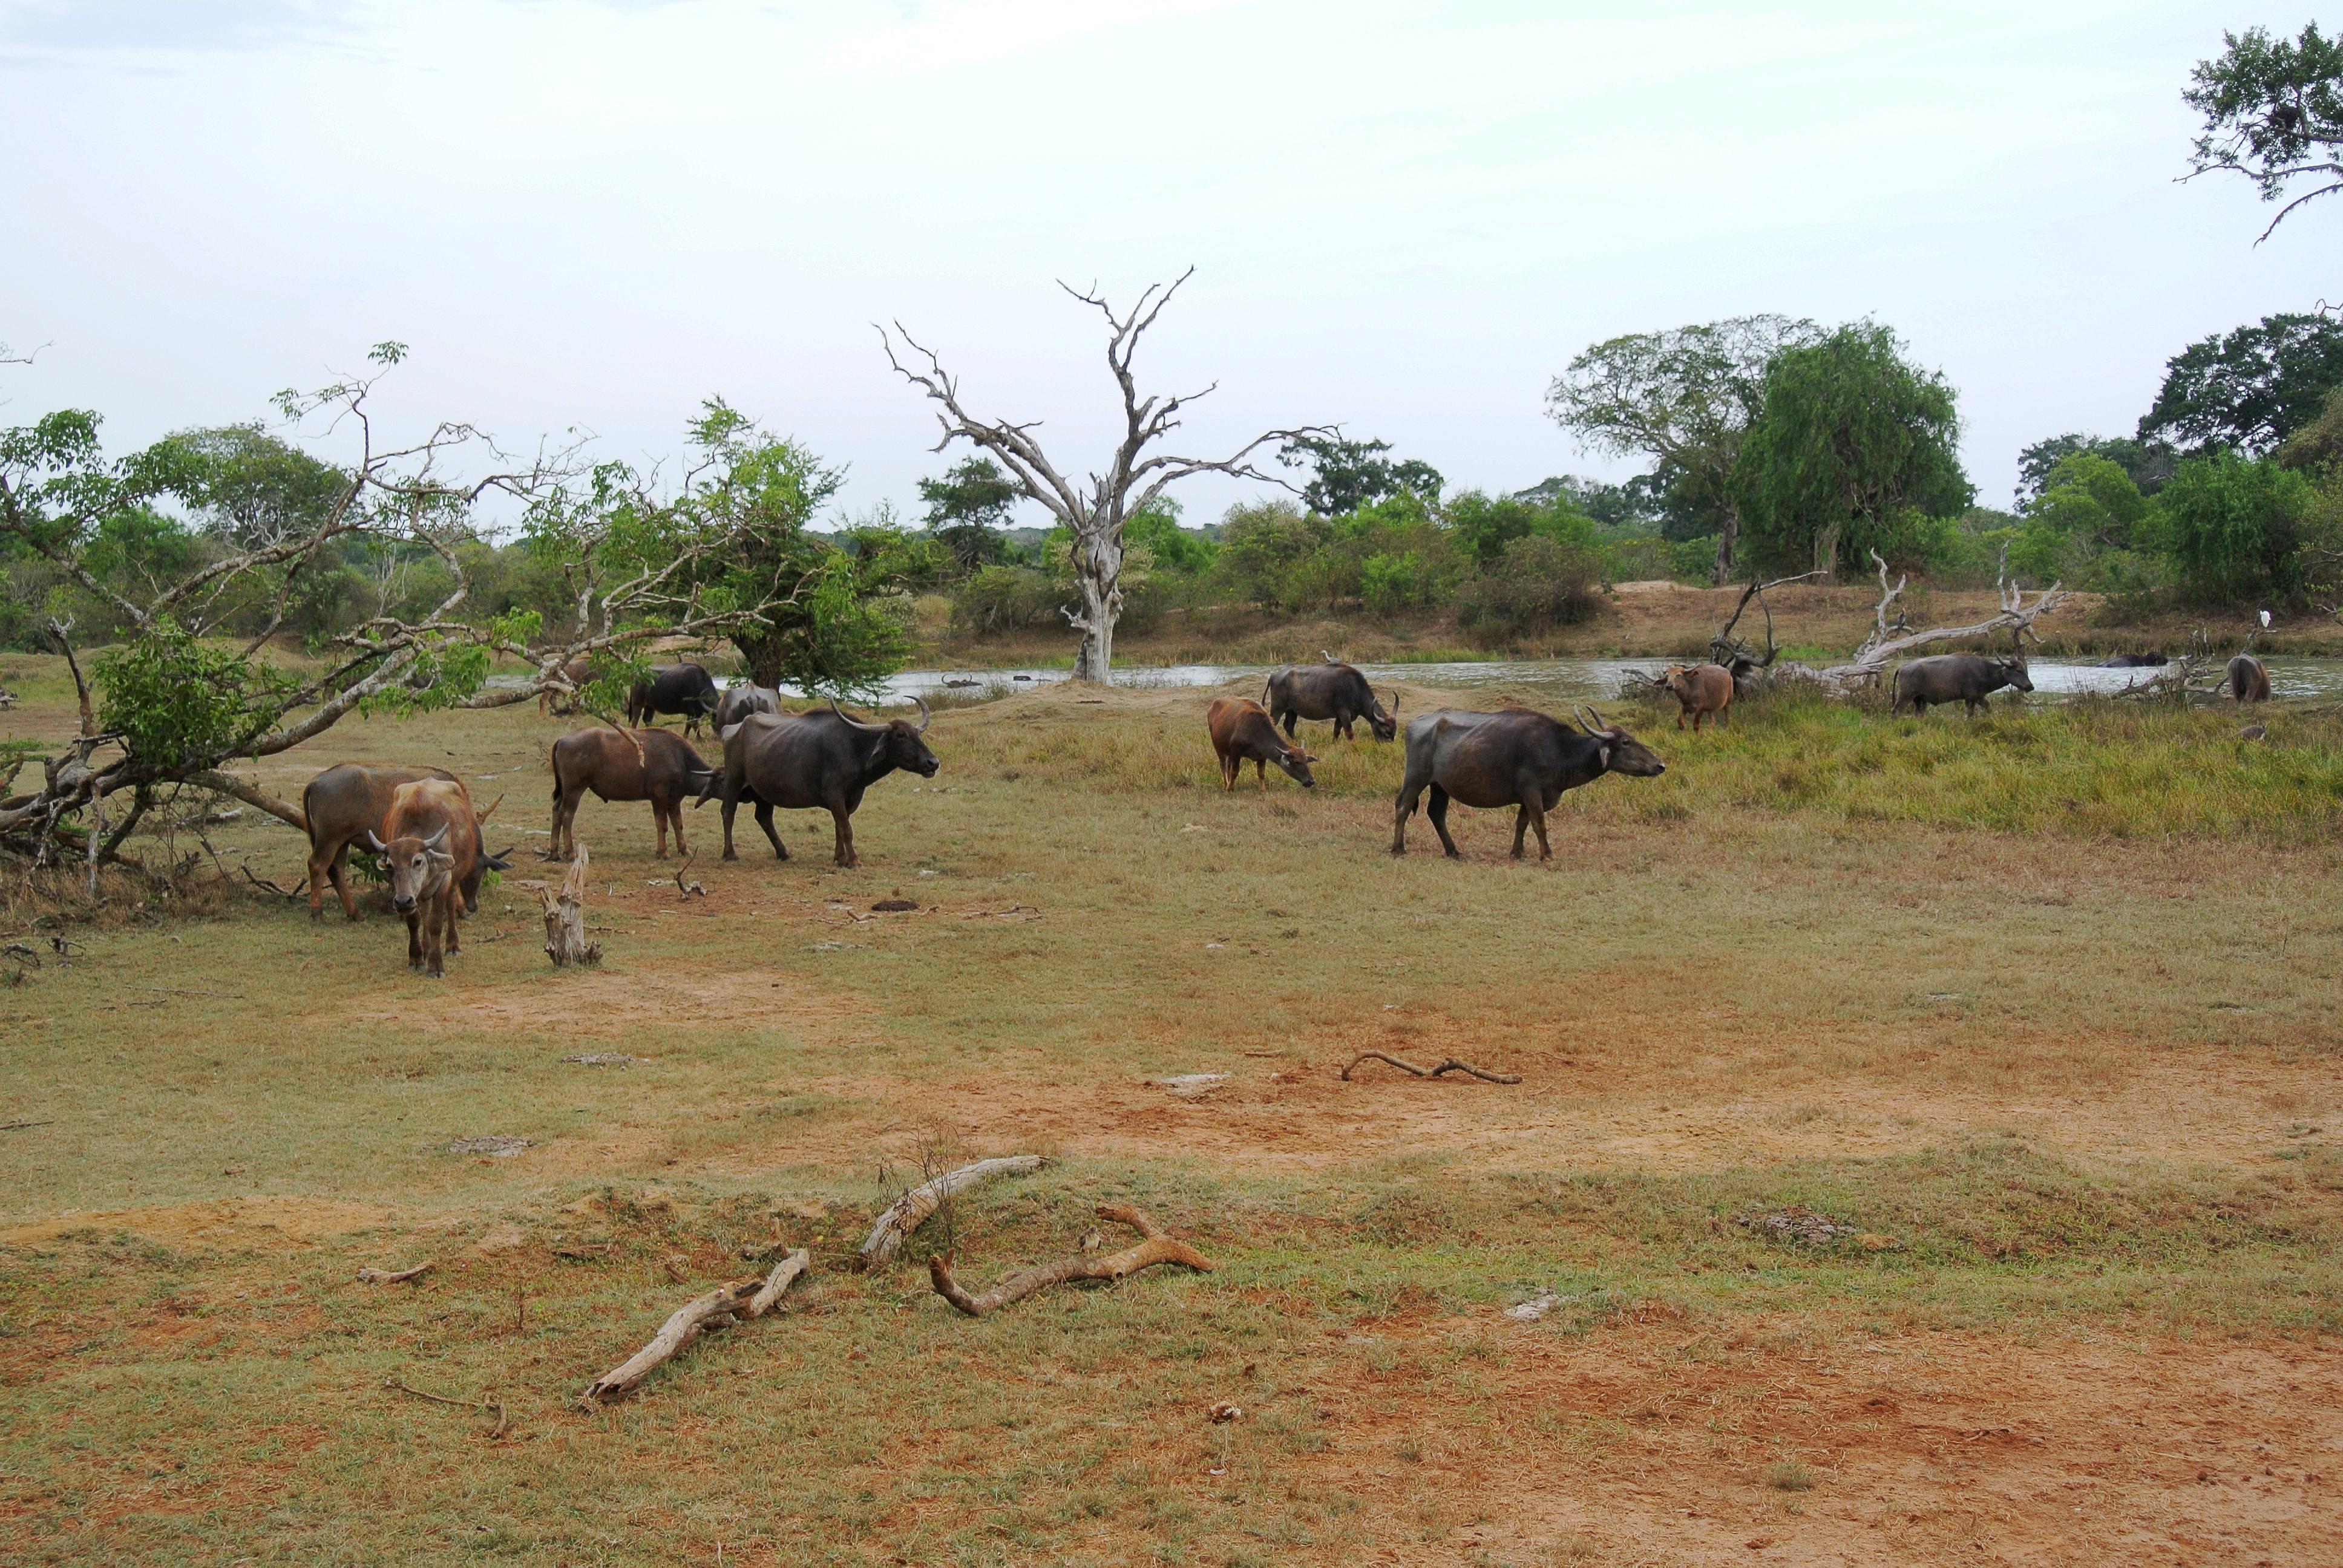 http://upload.wikimedia.org/wikipedia/commons/2/2e/Possibly_Wild_Water_Buffalos_Yala_National_Park.jpg?uselang=fr